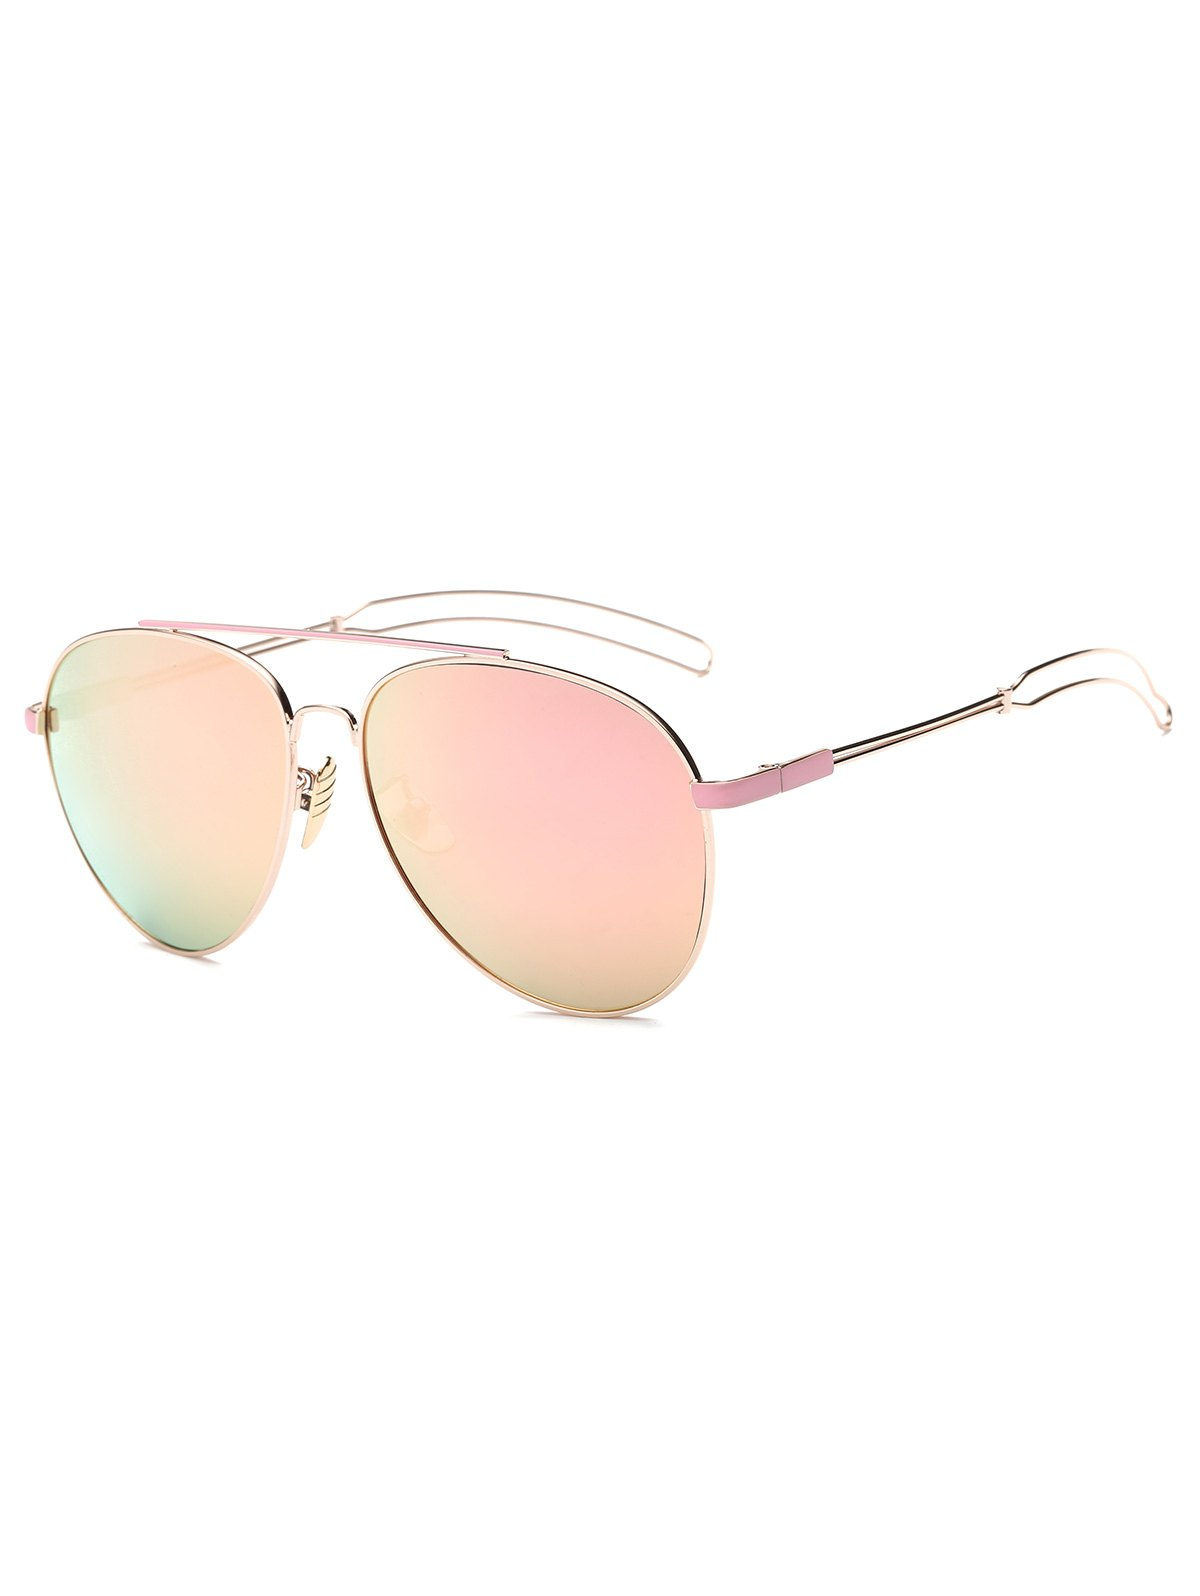 Hollow Out Leg Pilot Mirror Sunglasses